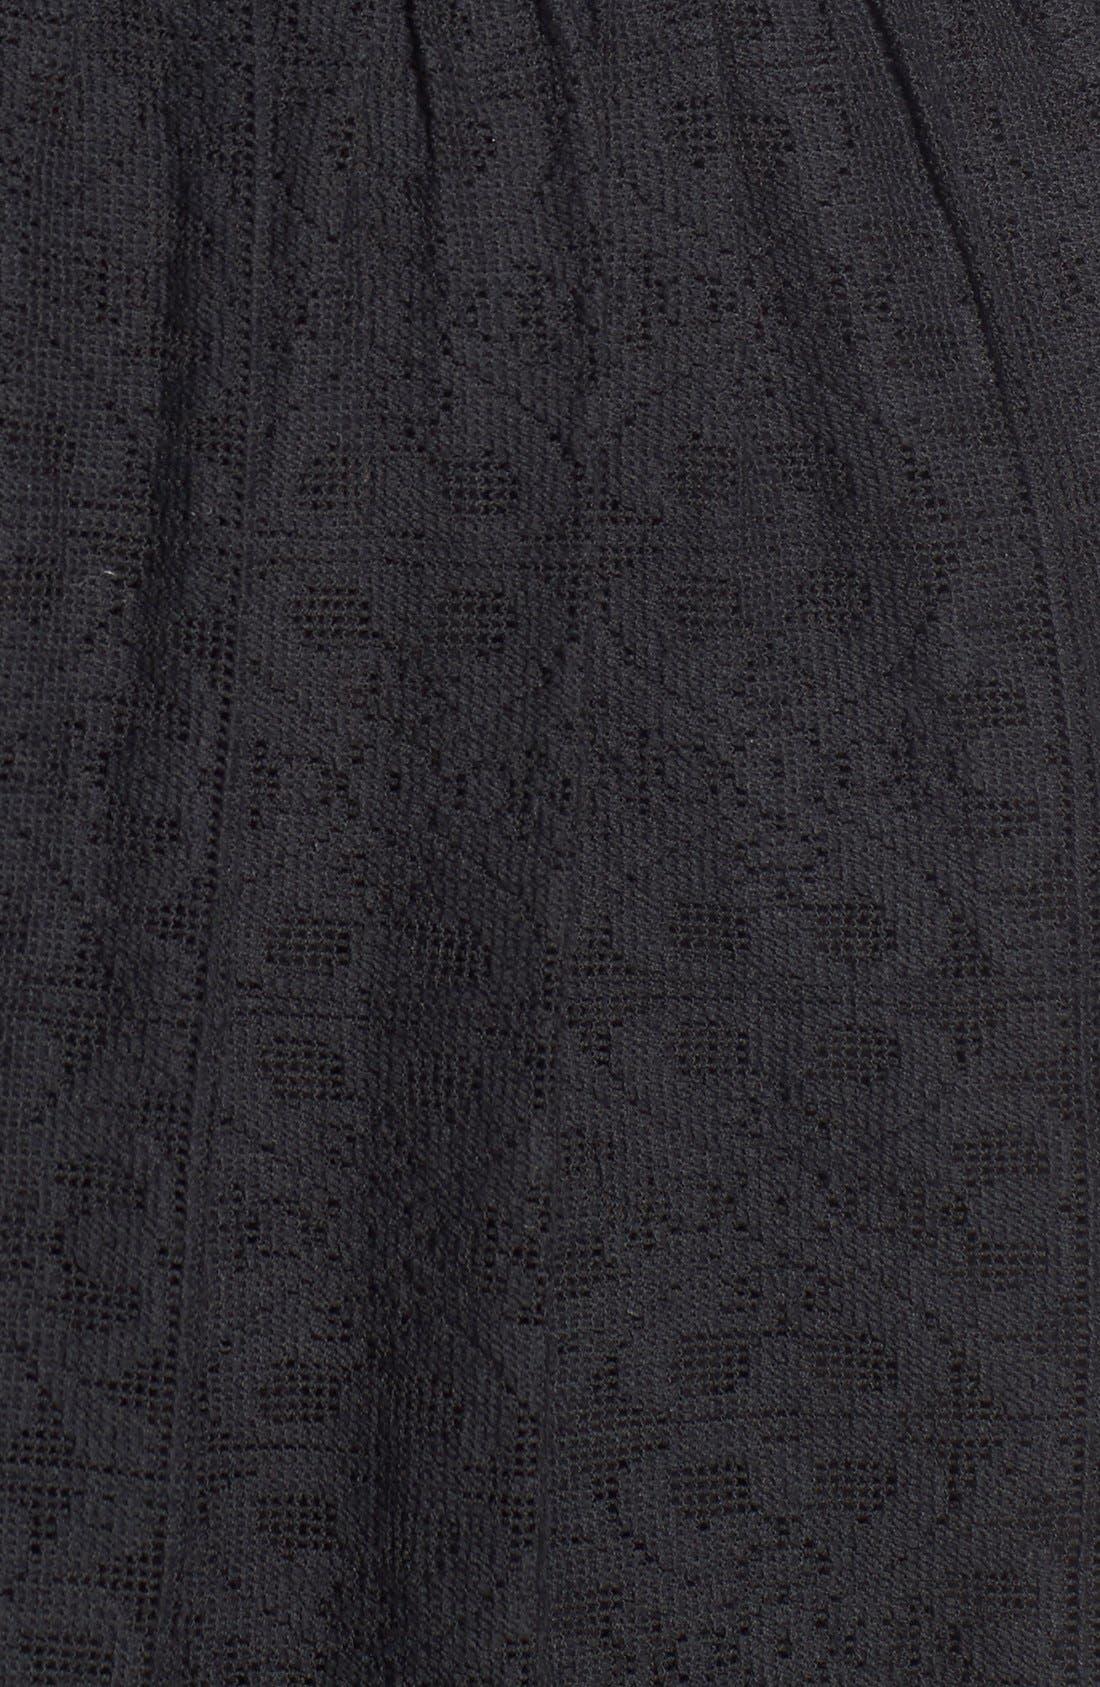 Lace Fit & Flare Midi Dress,                             Alternate thumbnail 3, color,                             001